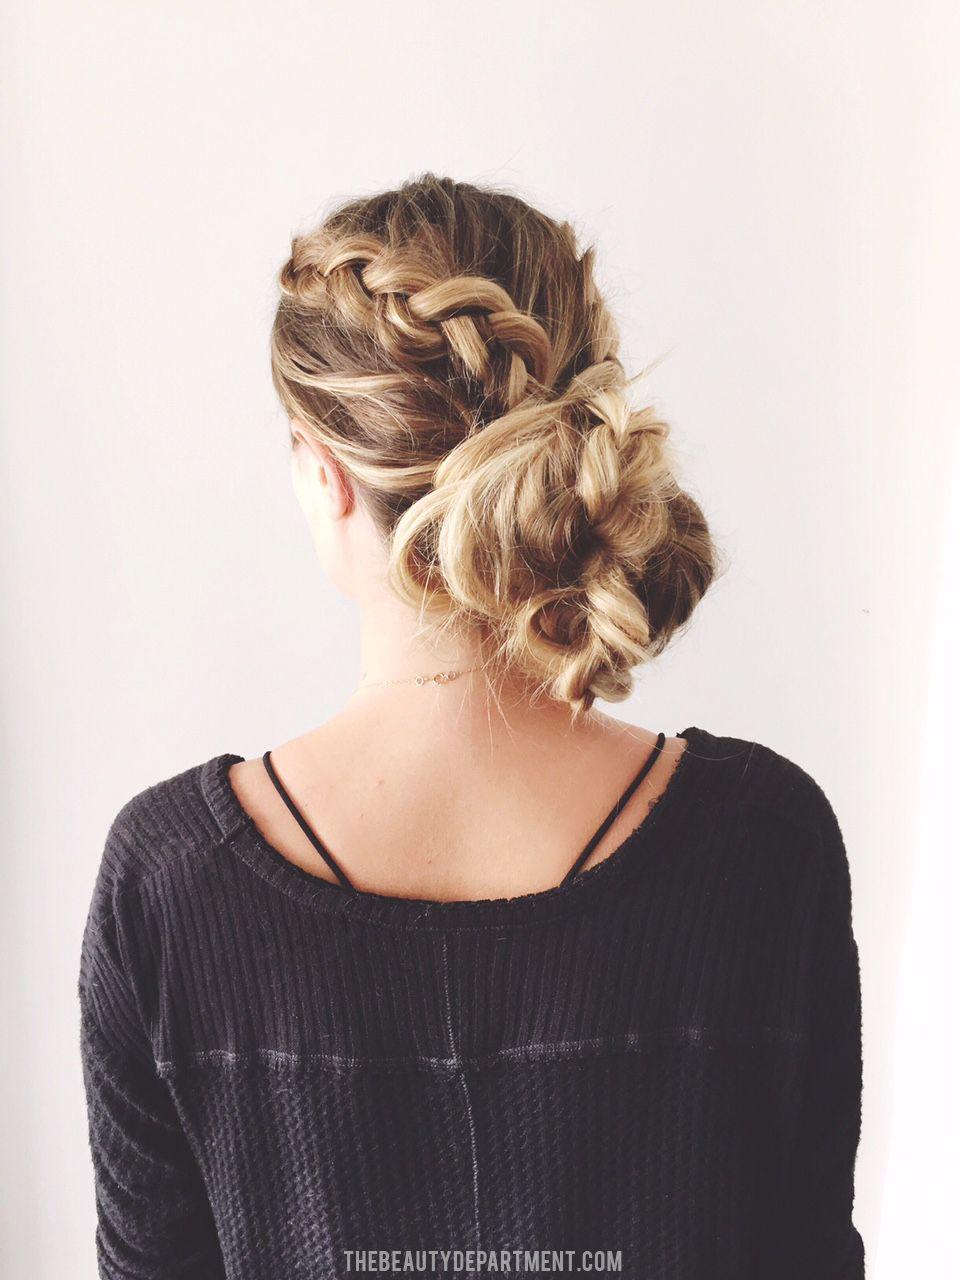 2-braids-3-ways-THREE.jpg 960×1280 pikseli